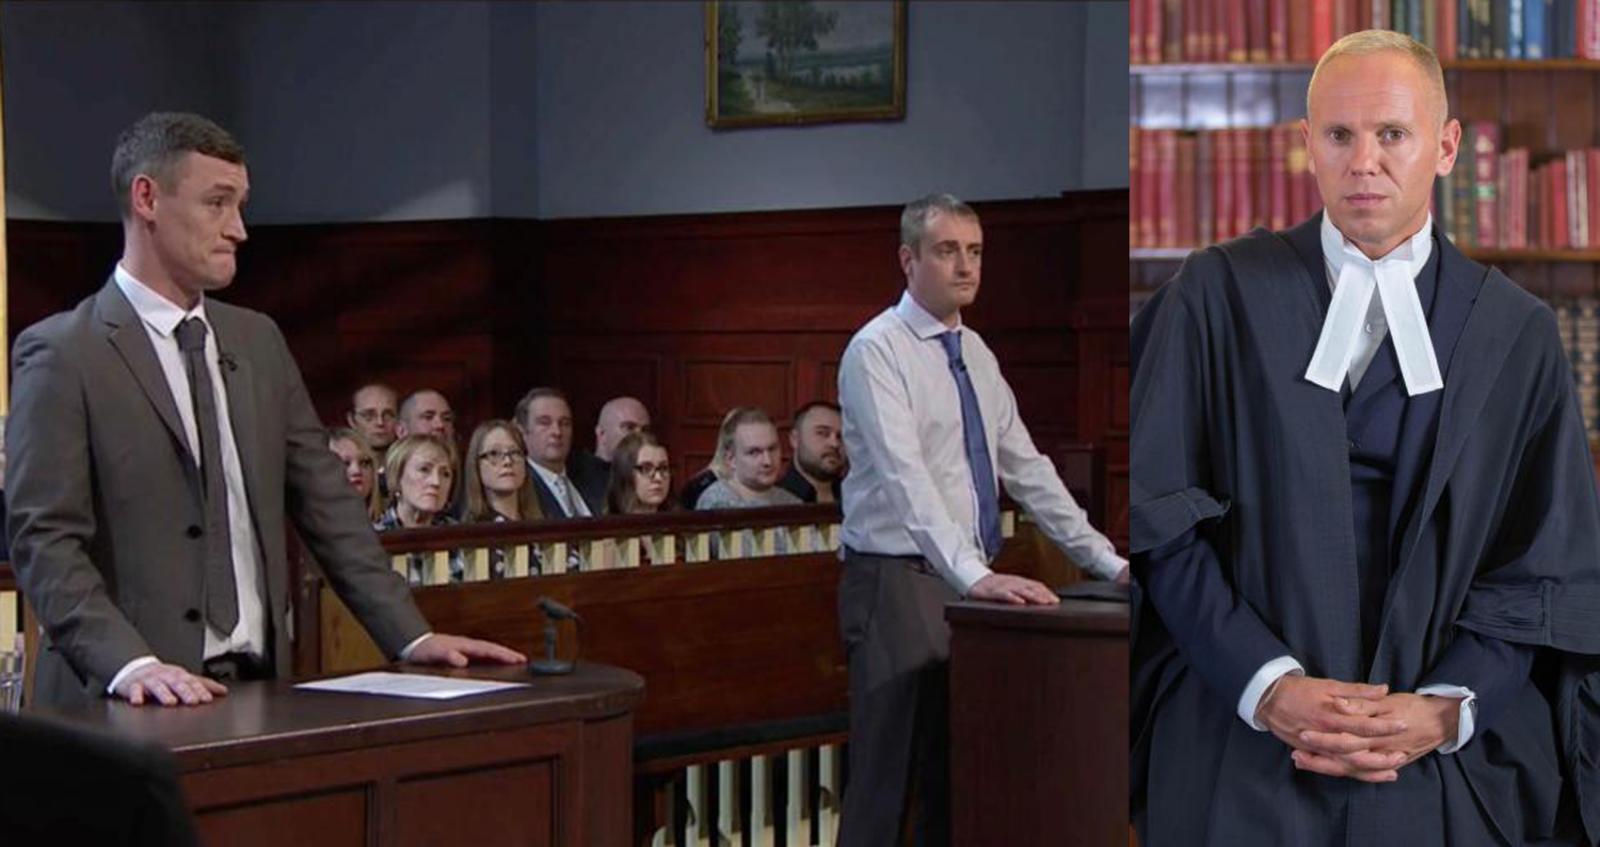 Judge Rinder conmen